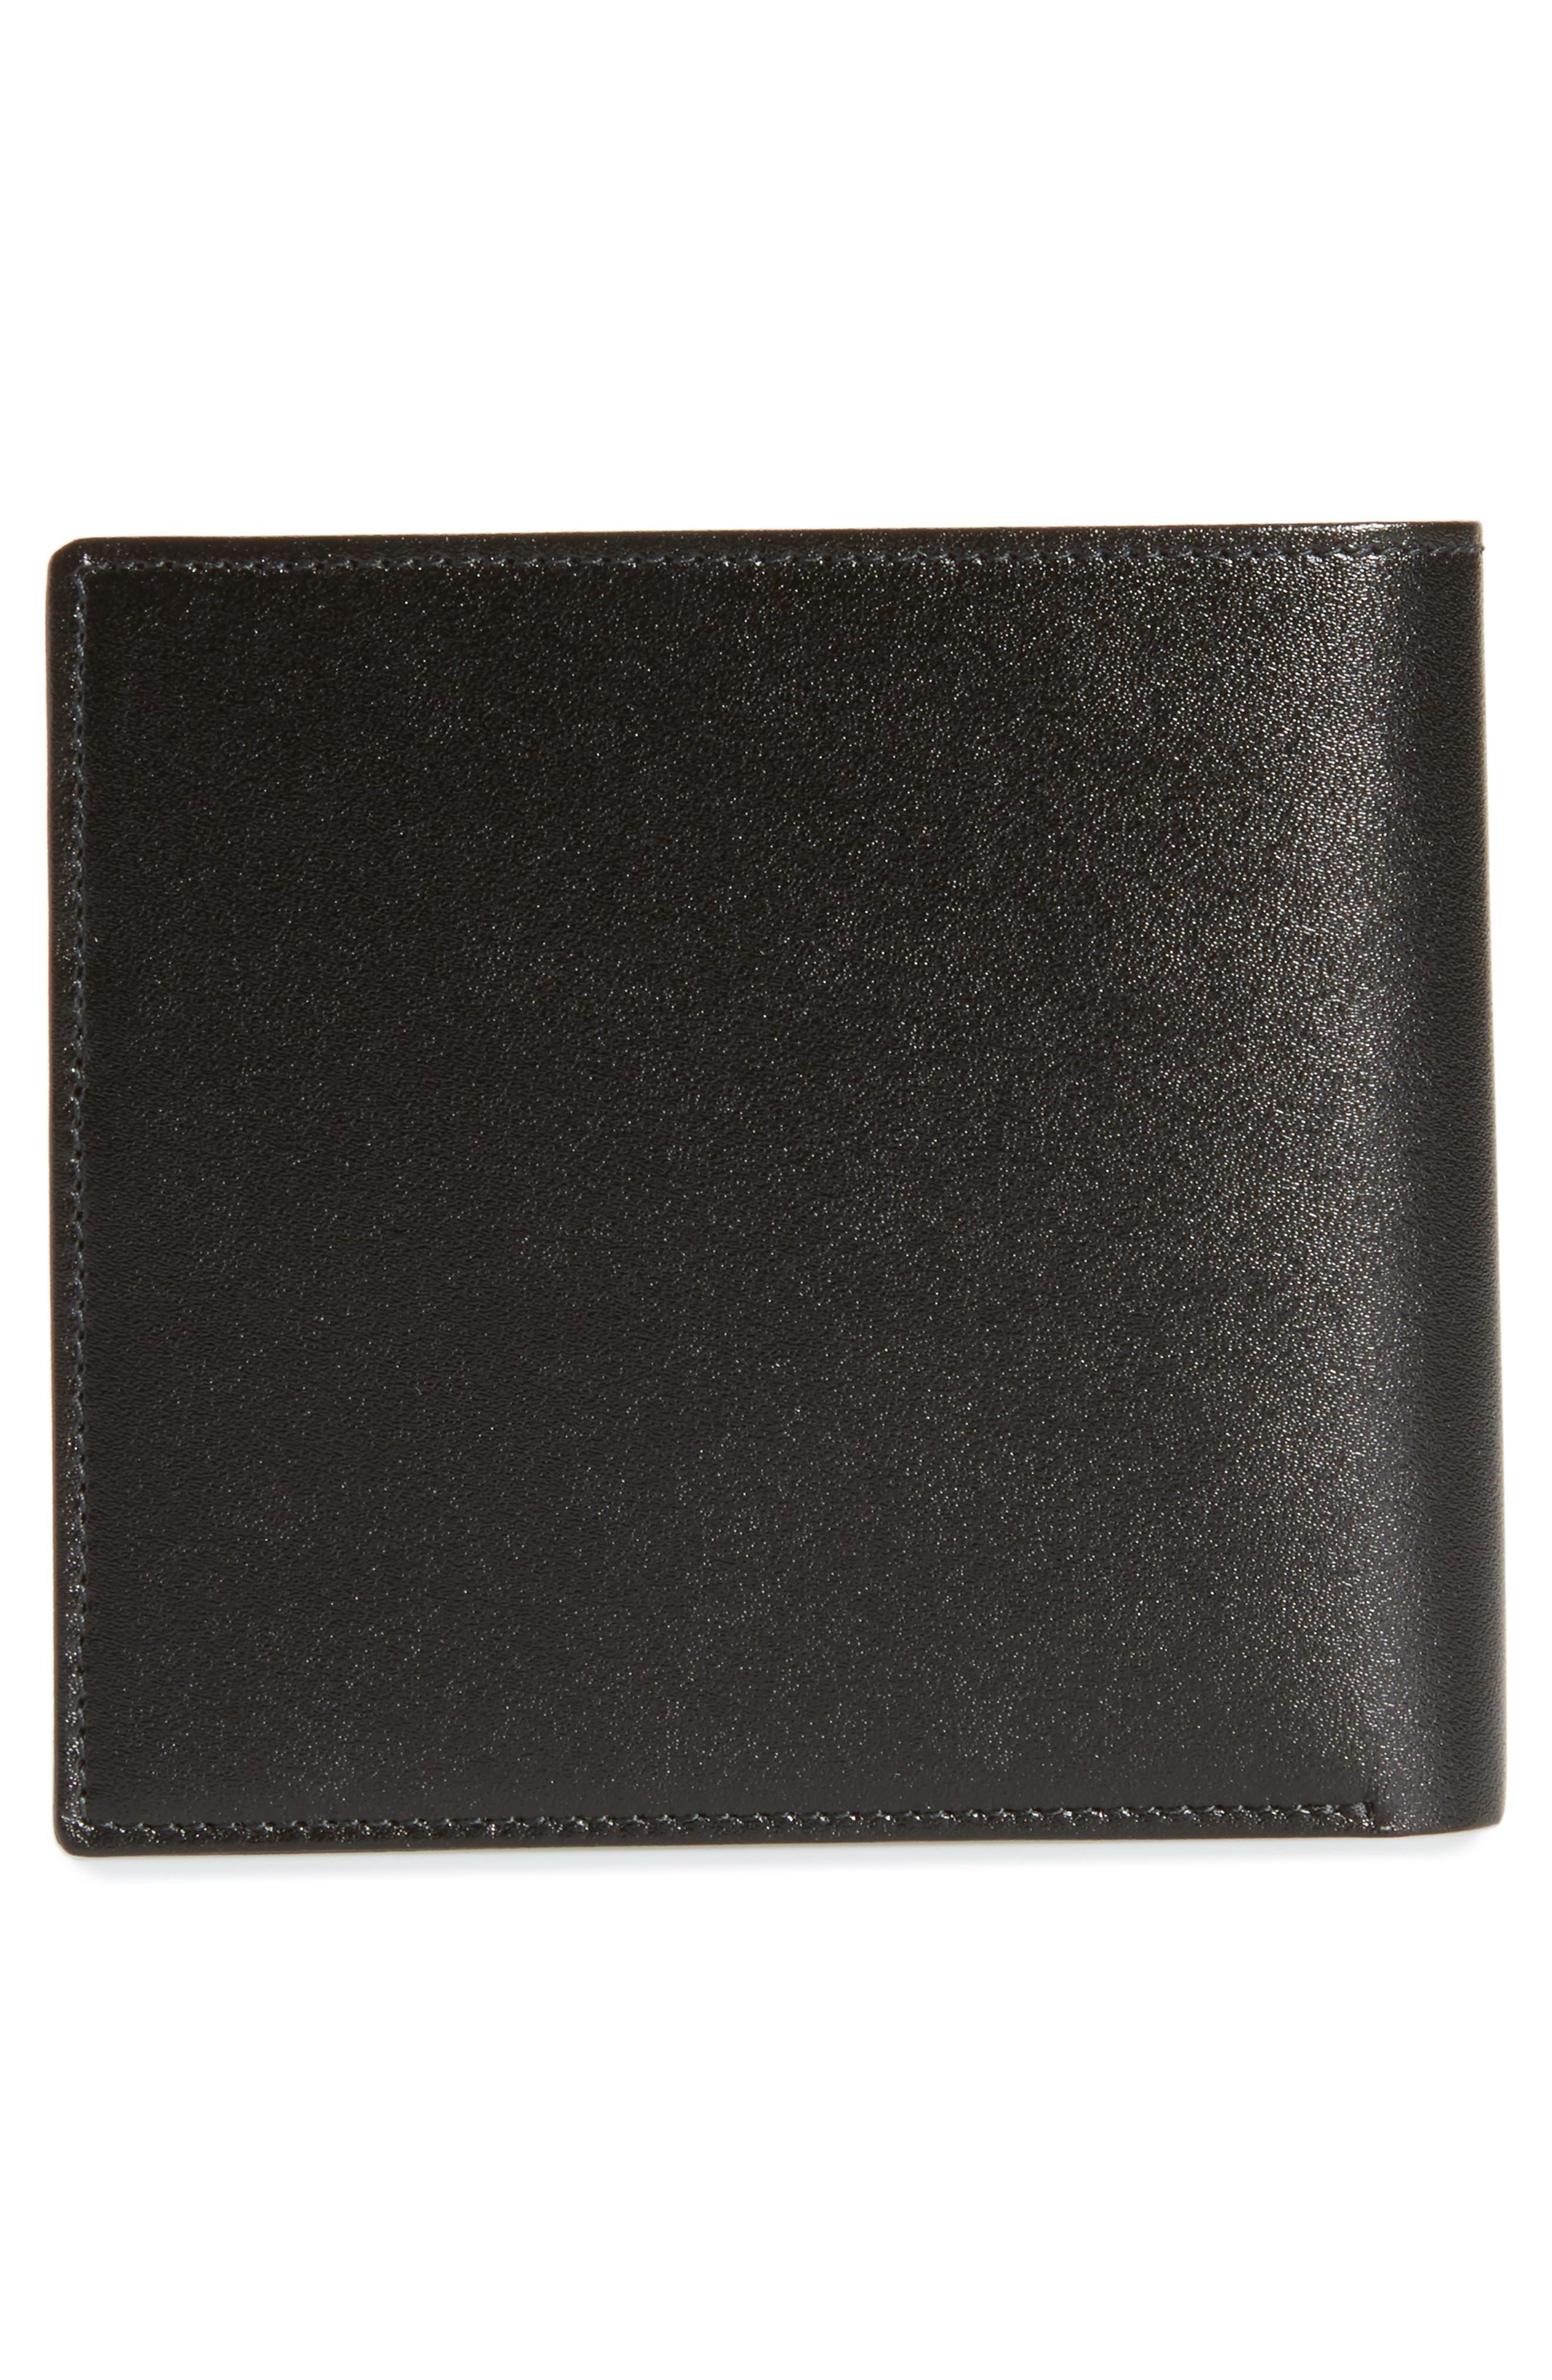 Meisterstück Leather Wallet,                             Alternate thumbnail 3, color,                             BLACK